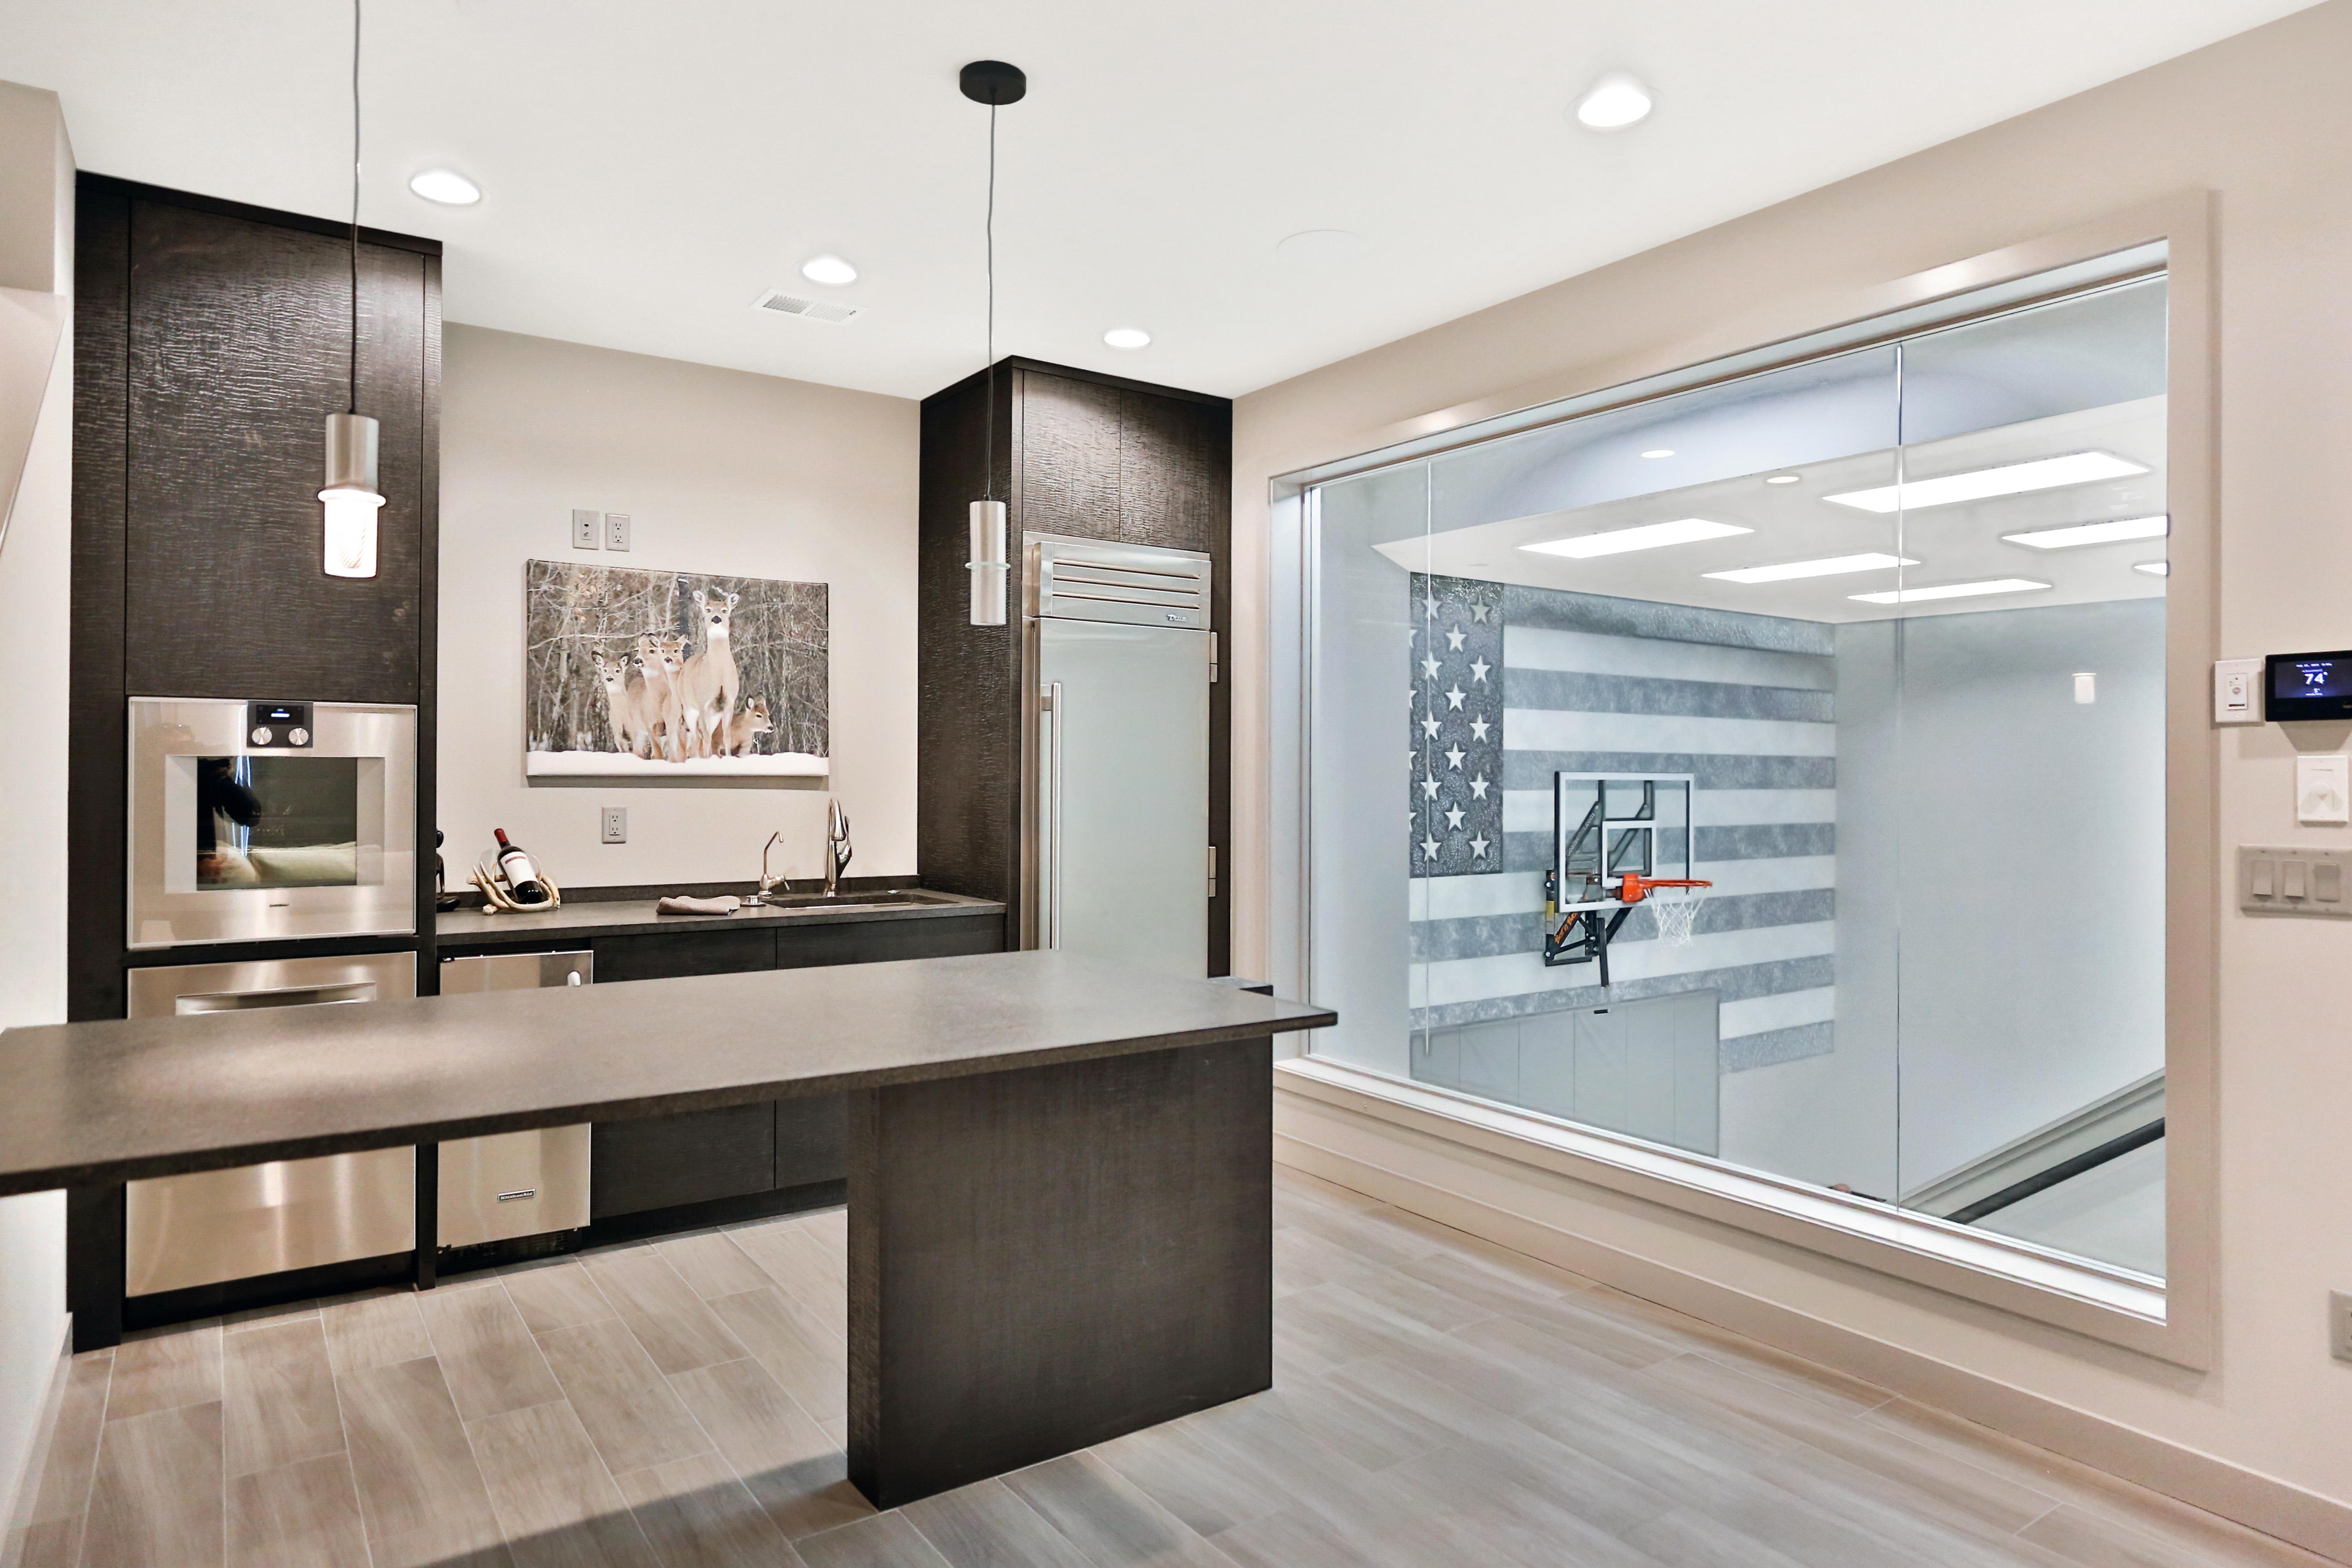 Lower Kitchen With Sport court